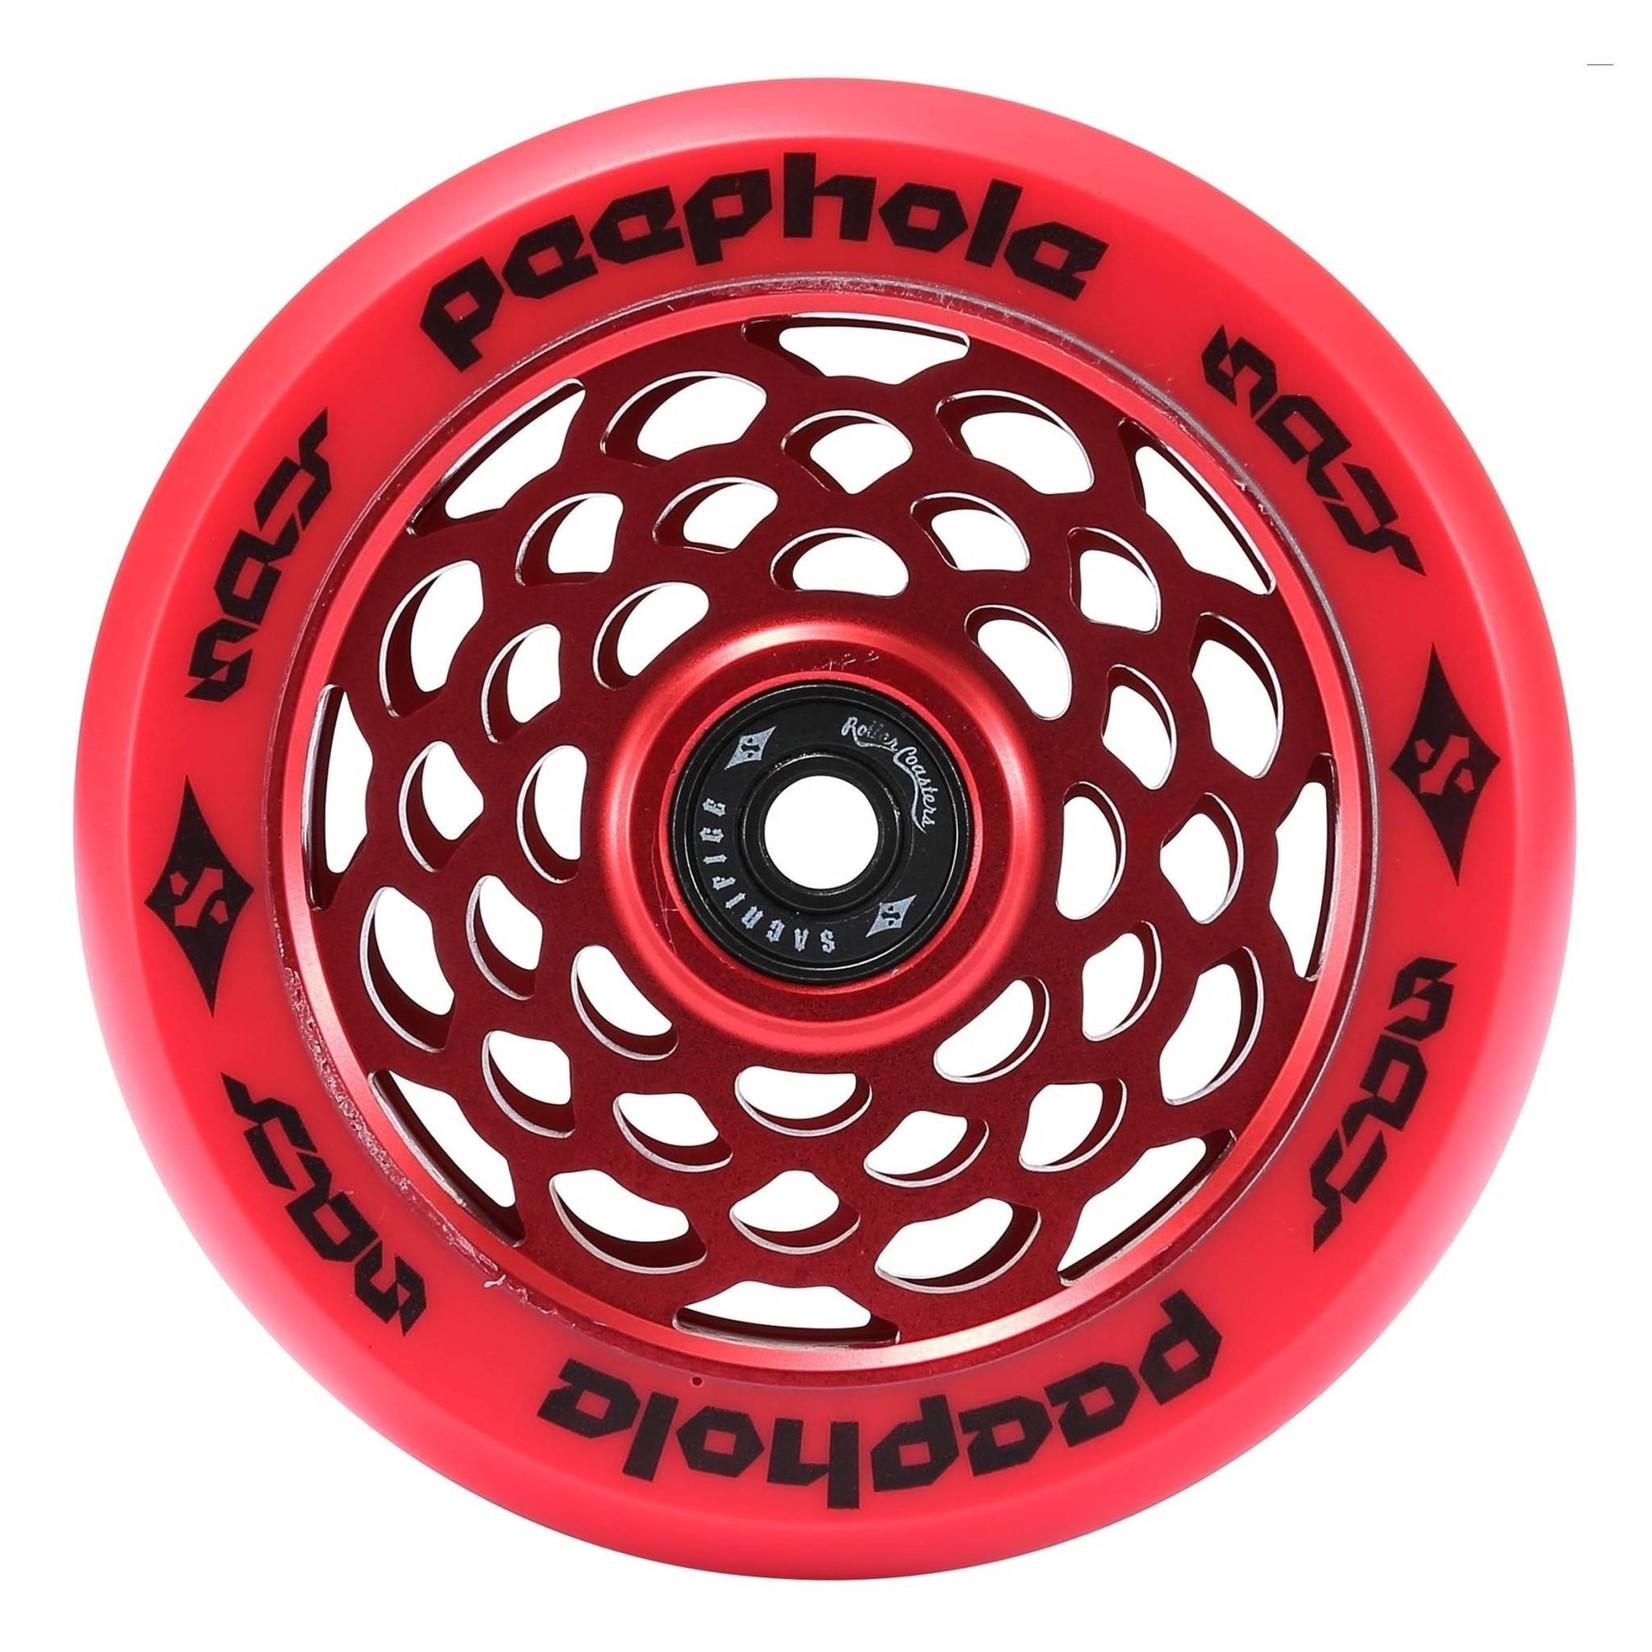 Sacrifice PeepHole 110mm Scooter Wheel Red